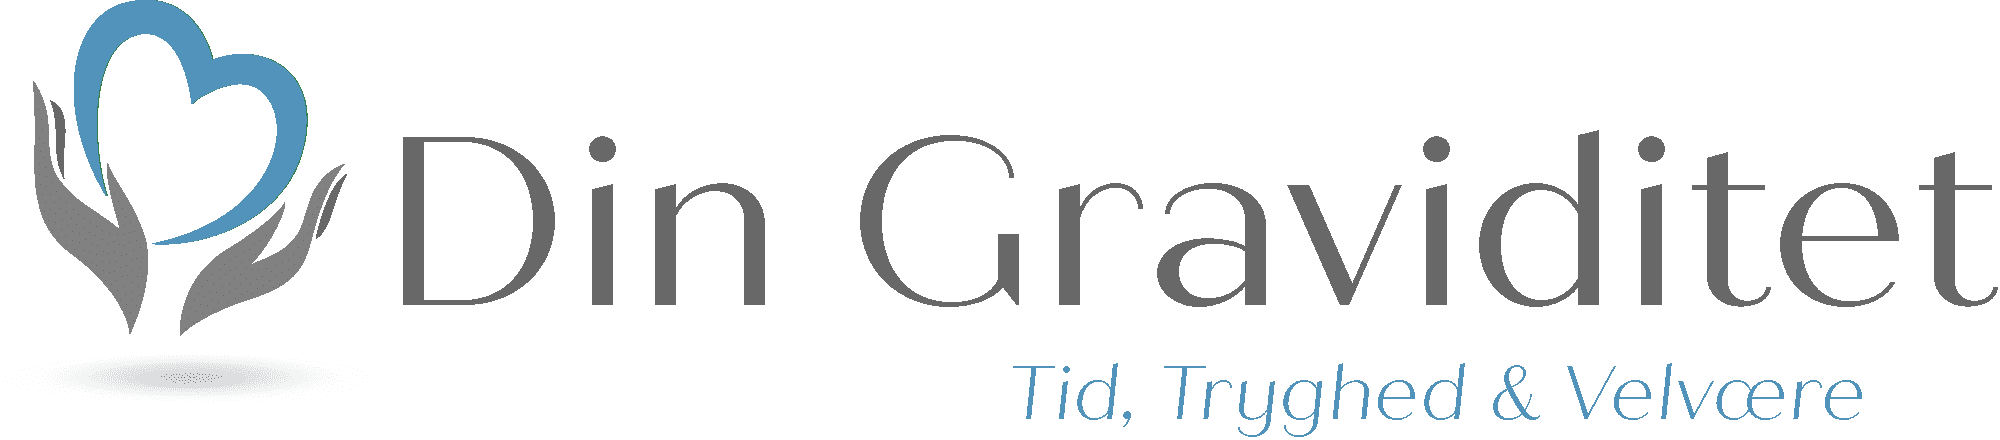 Din Graviditet Logo